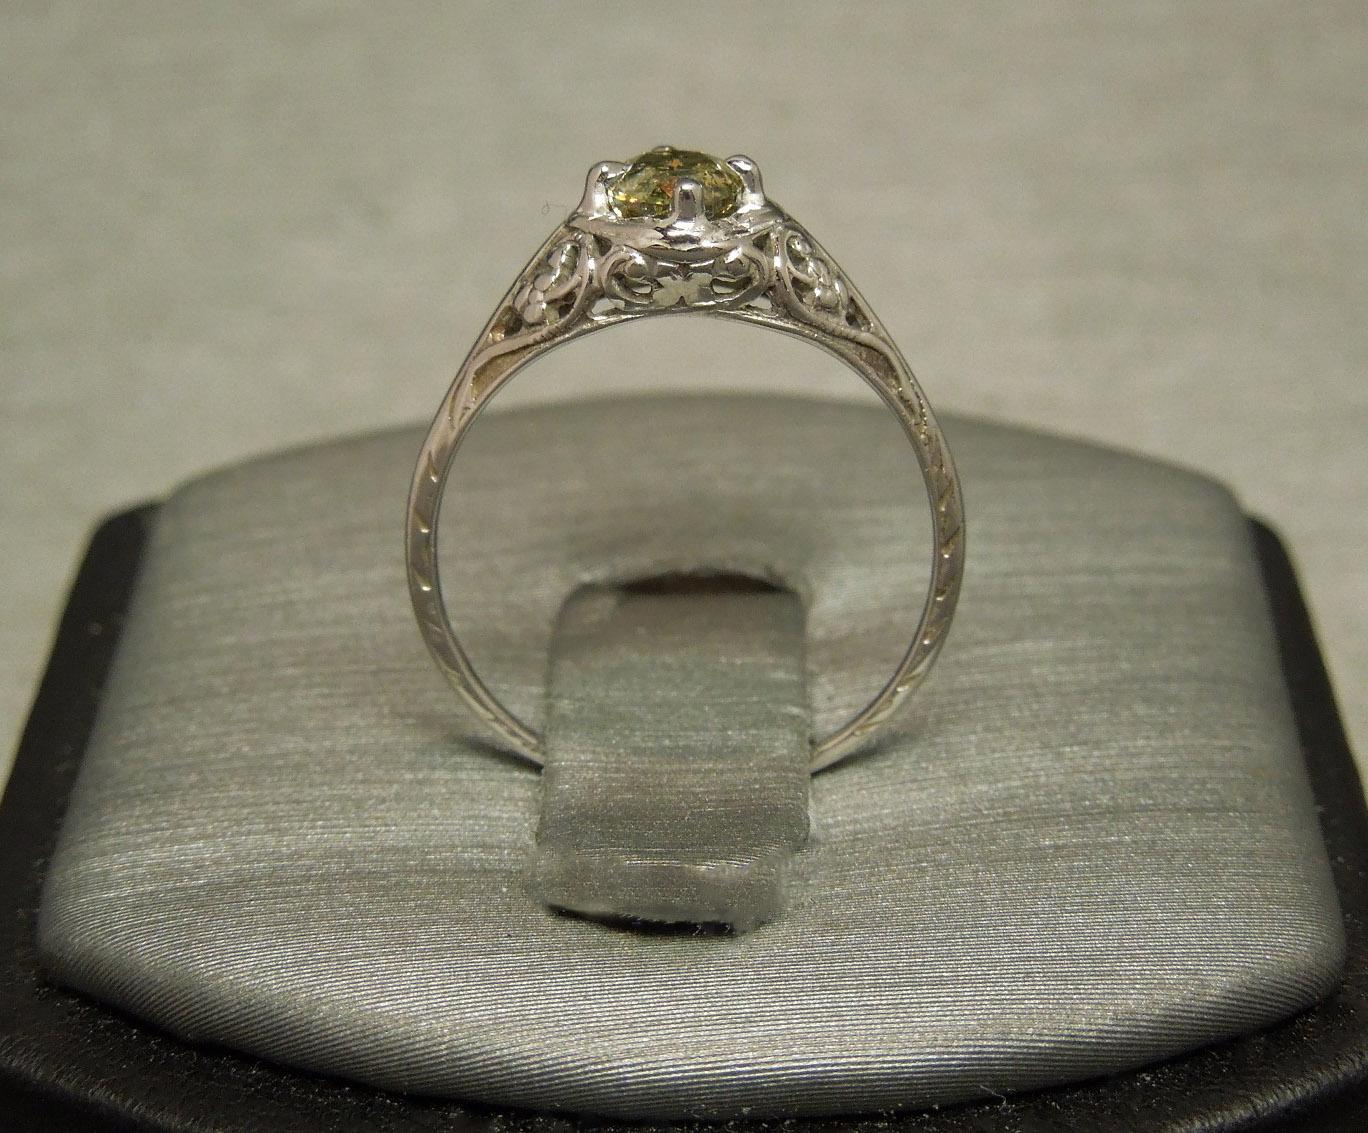 Antique Filigree Green Diamond 57ct I2 Solitaire